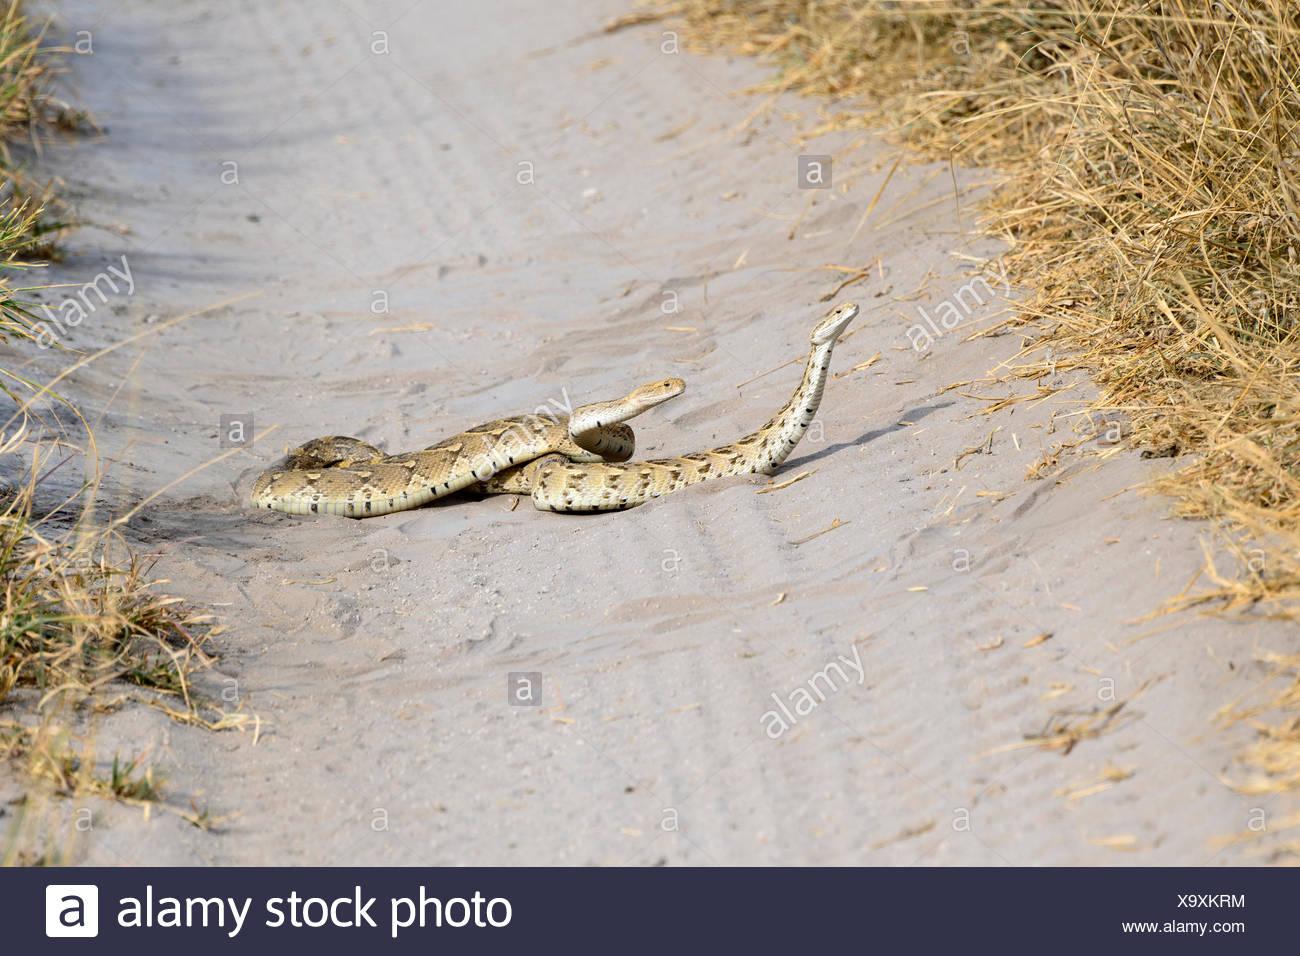 Puff Adder, Central Kalahari Game Reserve, Botswana, Snake, (Bitis arietans) - Stock Image